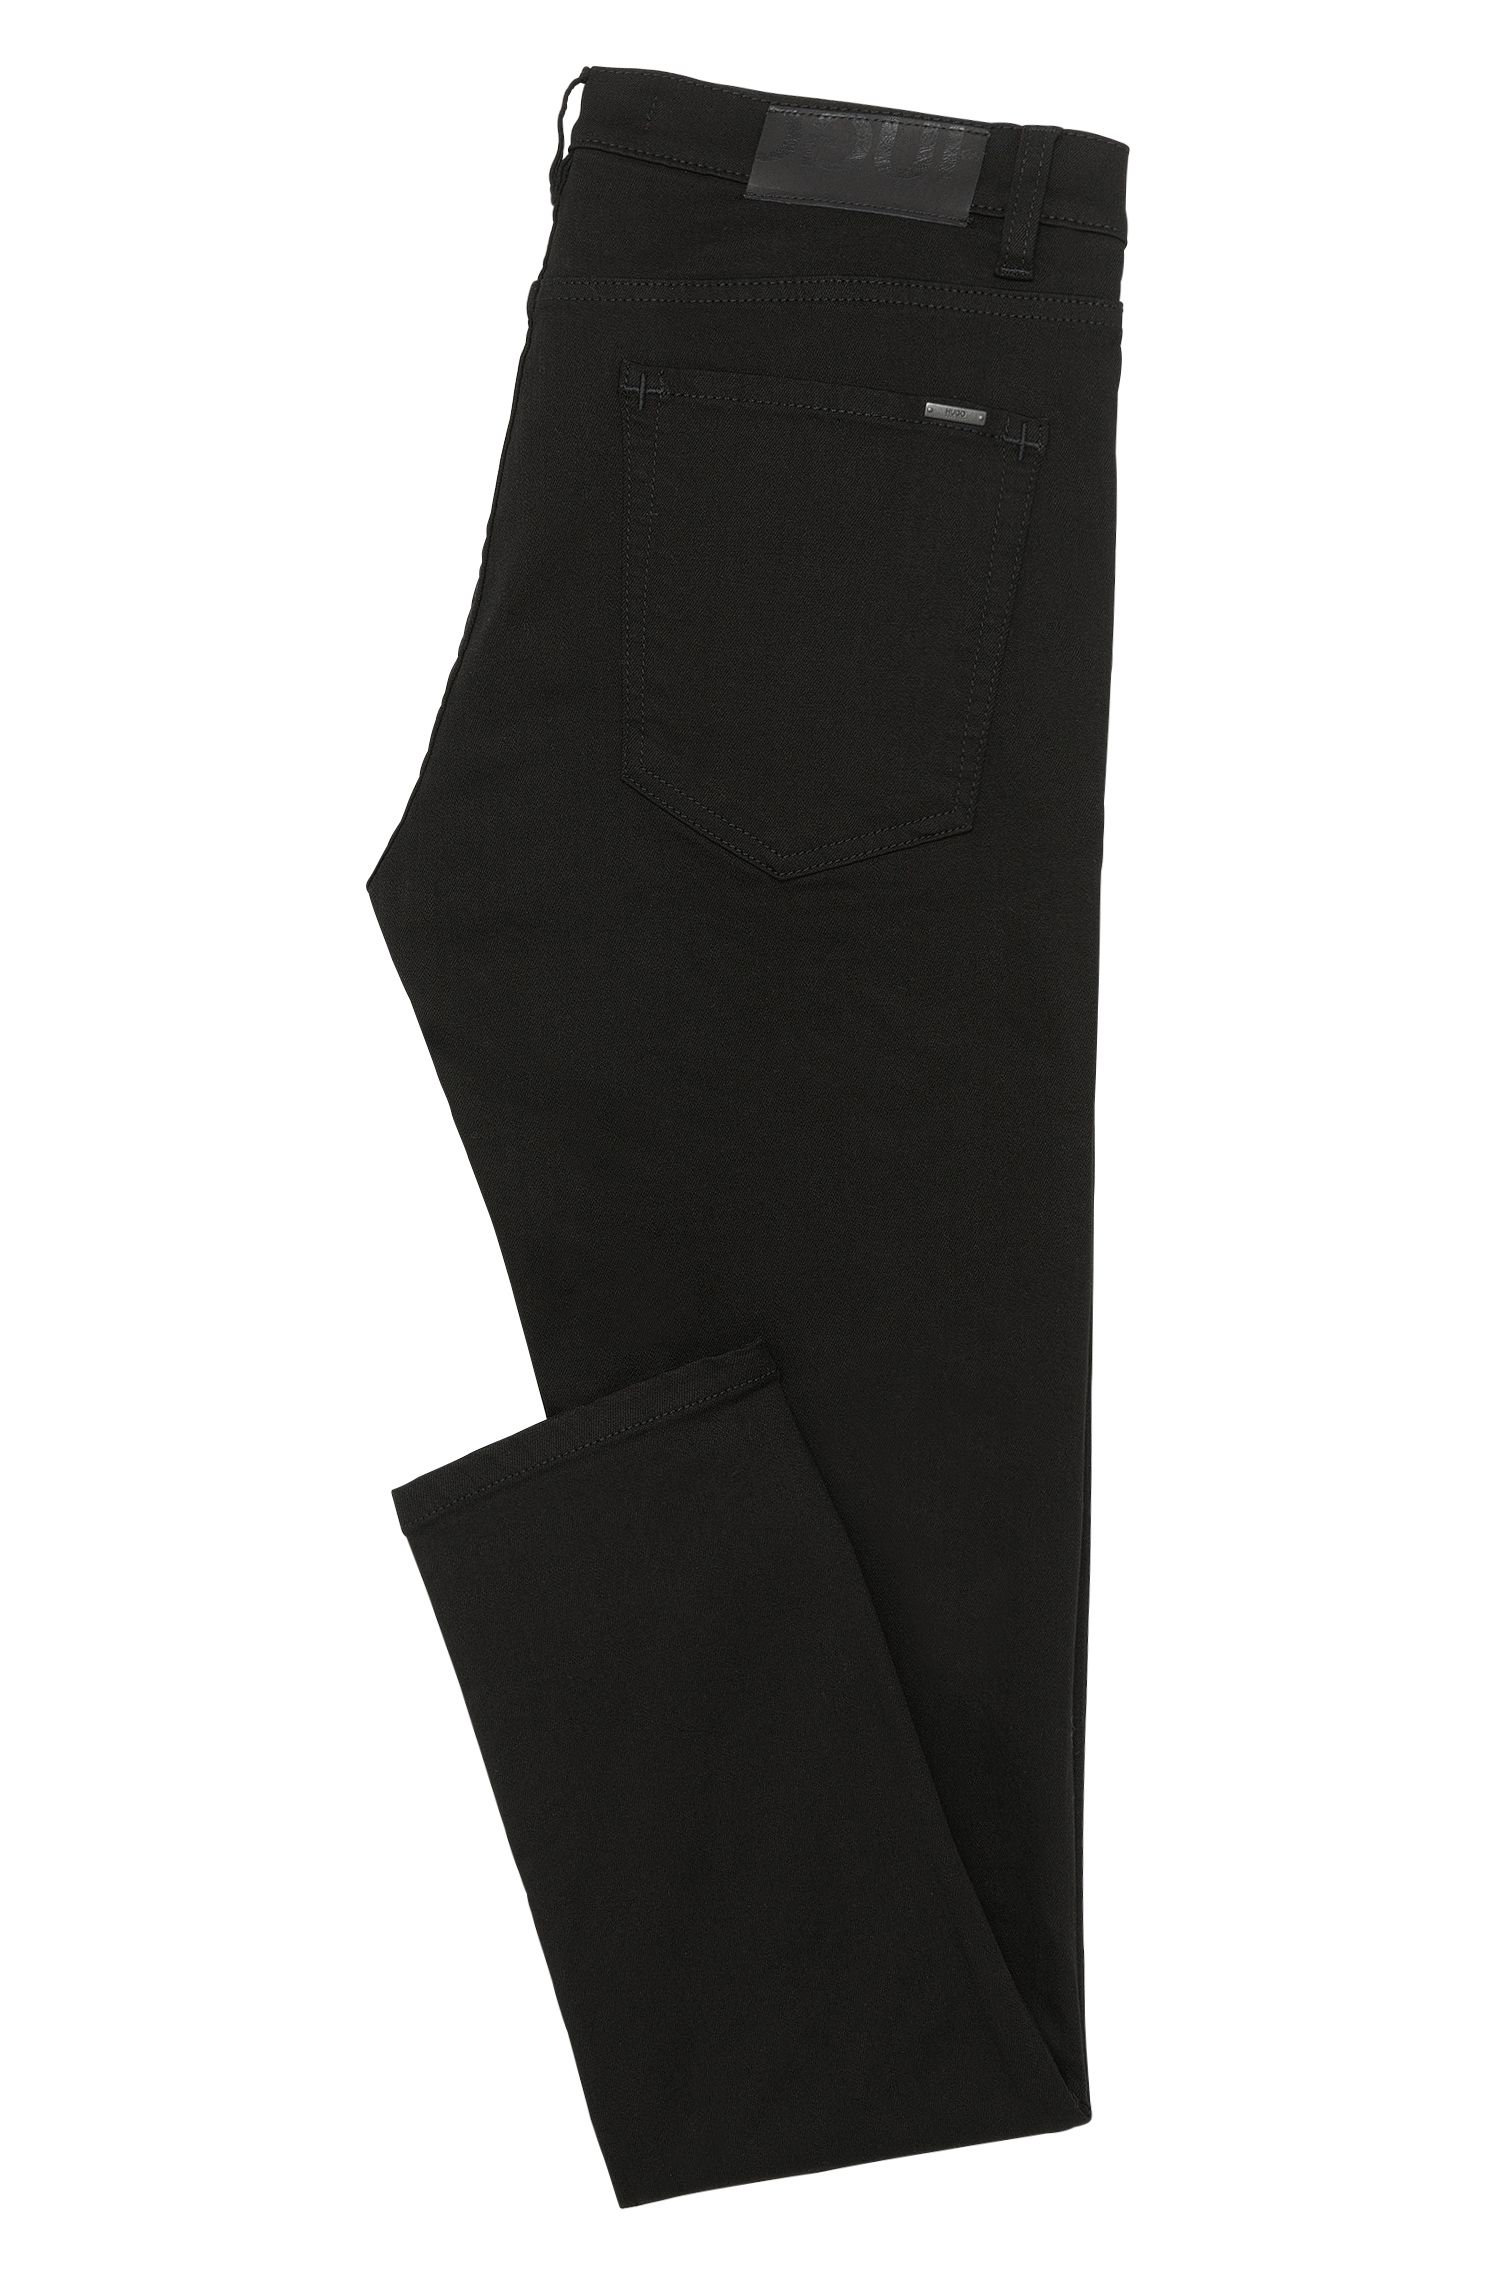 Unifarbene Skinny-Fit Jeans aus Baumwoll-Mix: 'HUGO 131'